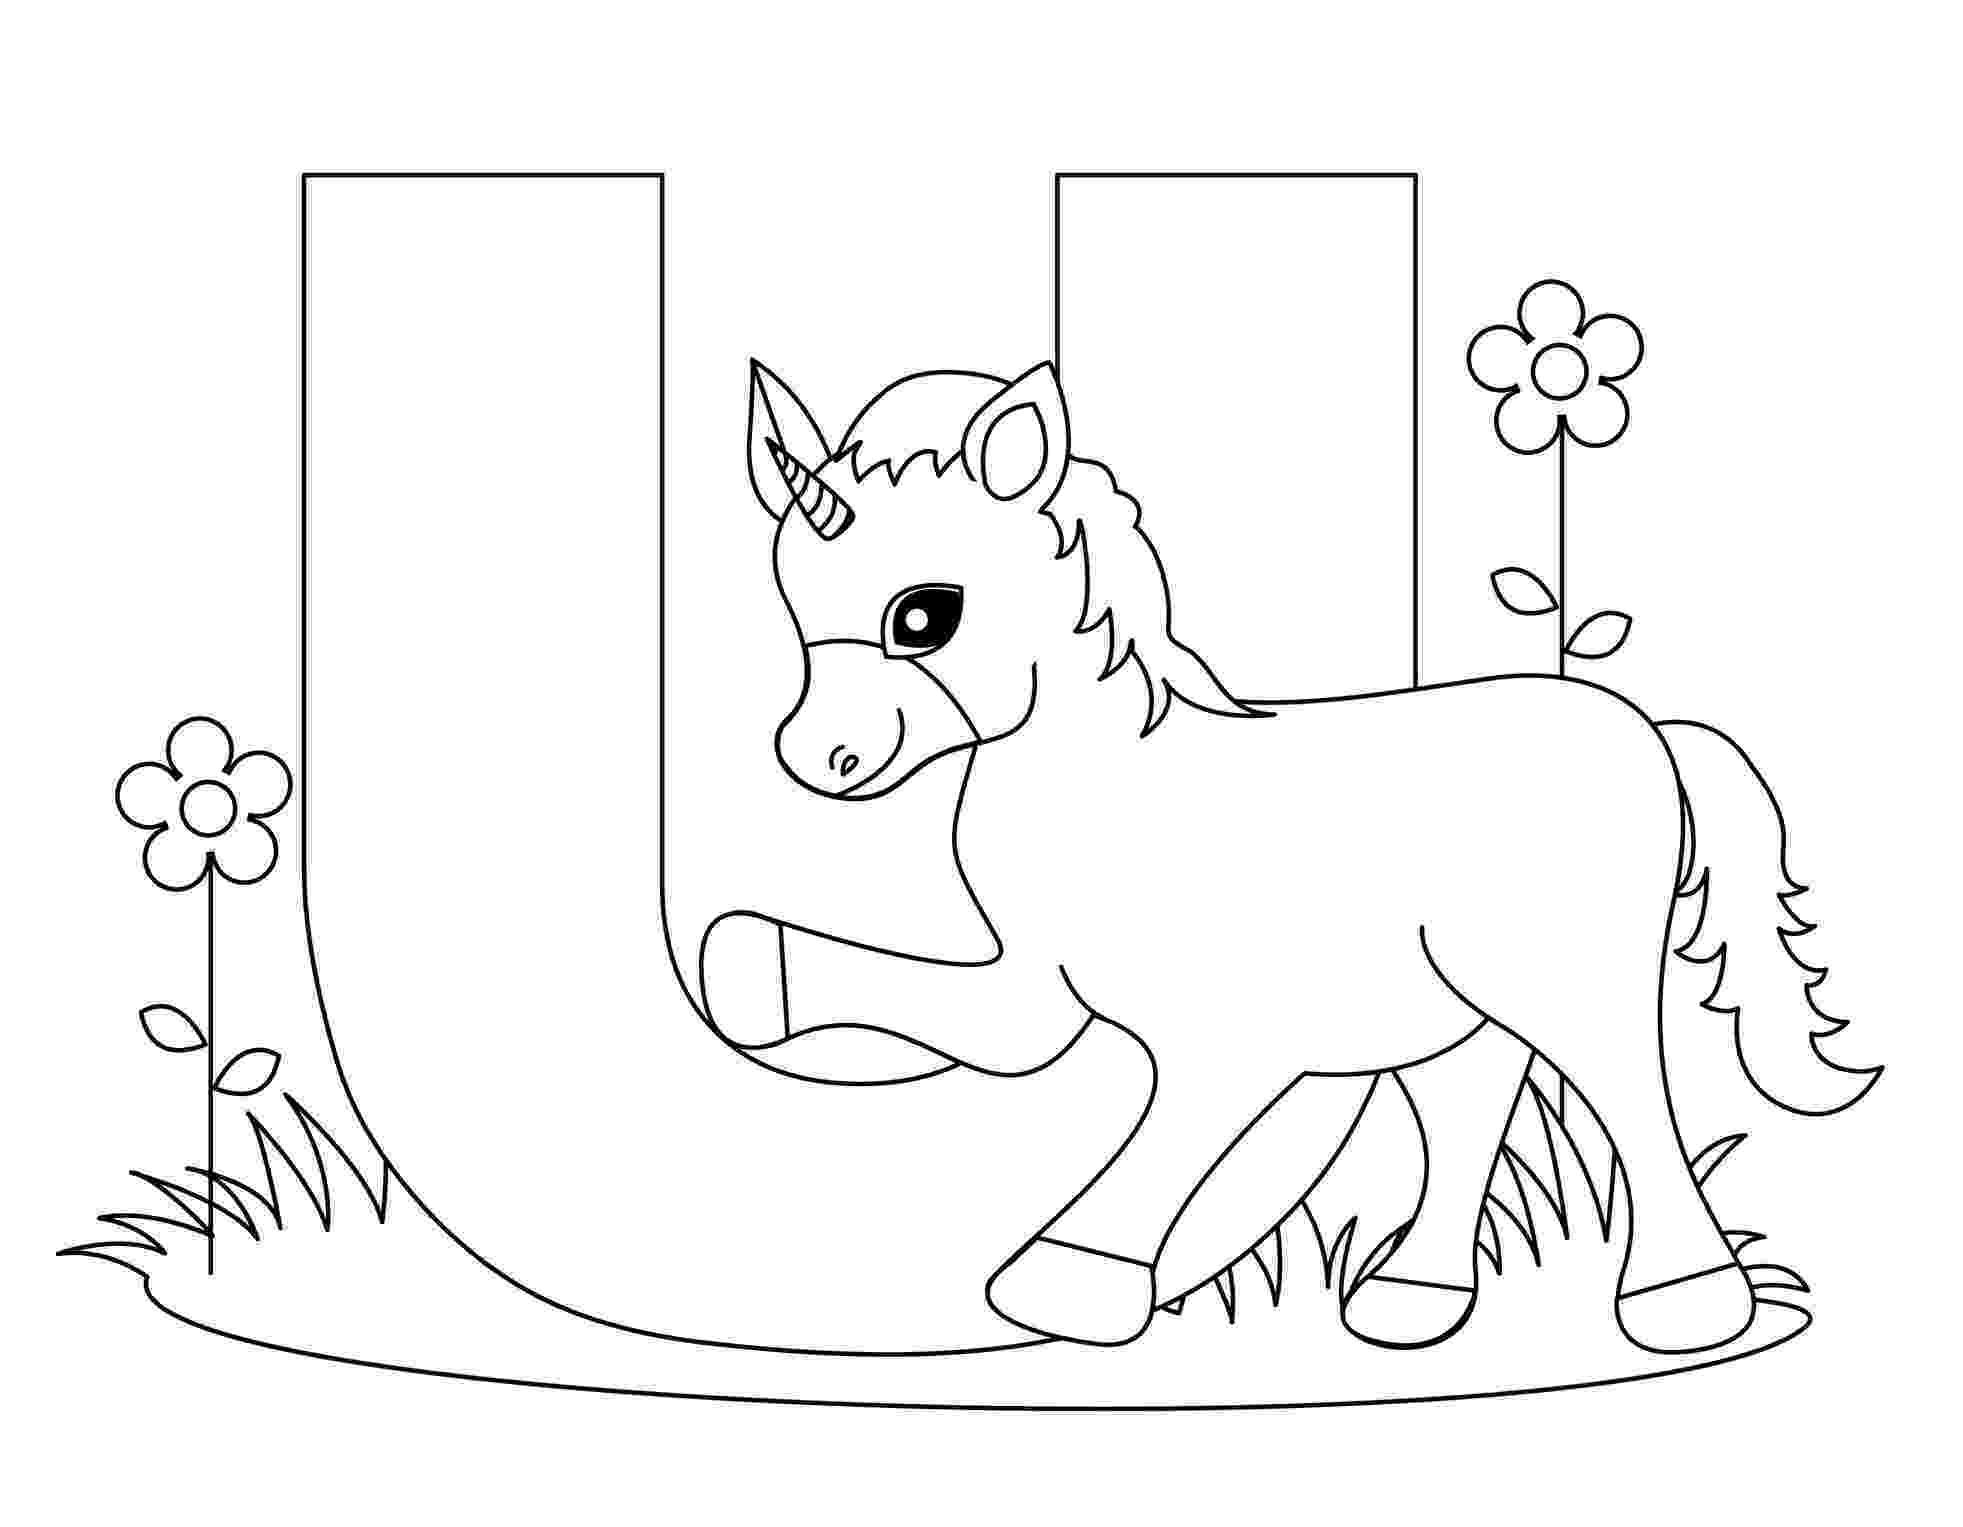 abc coloring book printable free printable abc coloring pages for kids book printable abc coloring